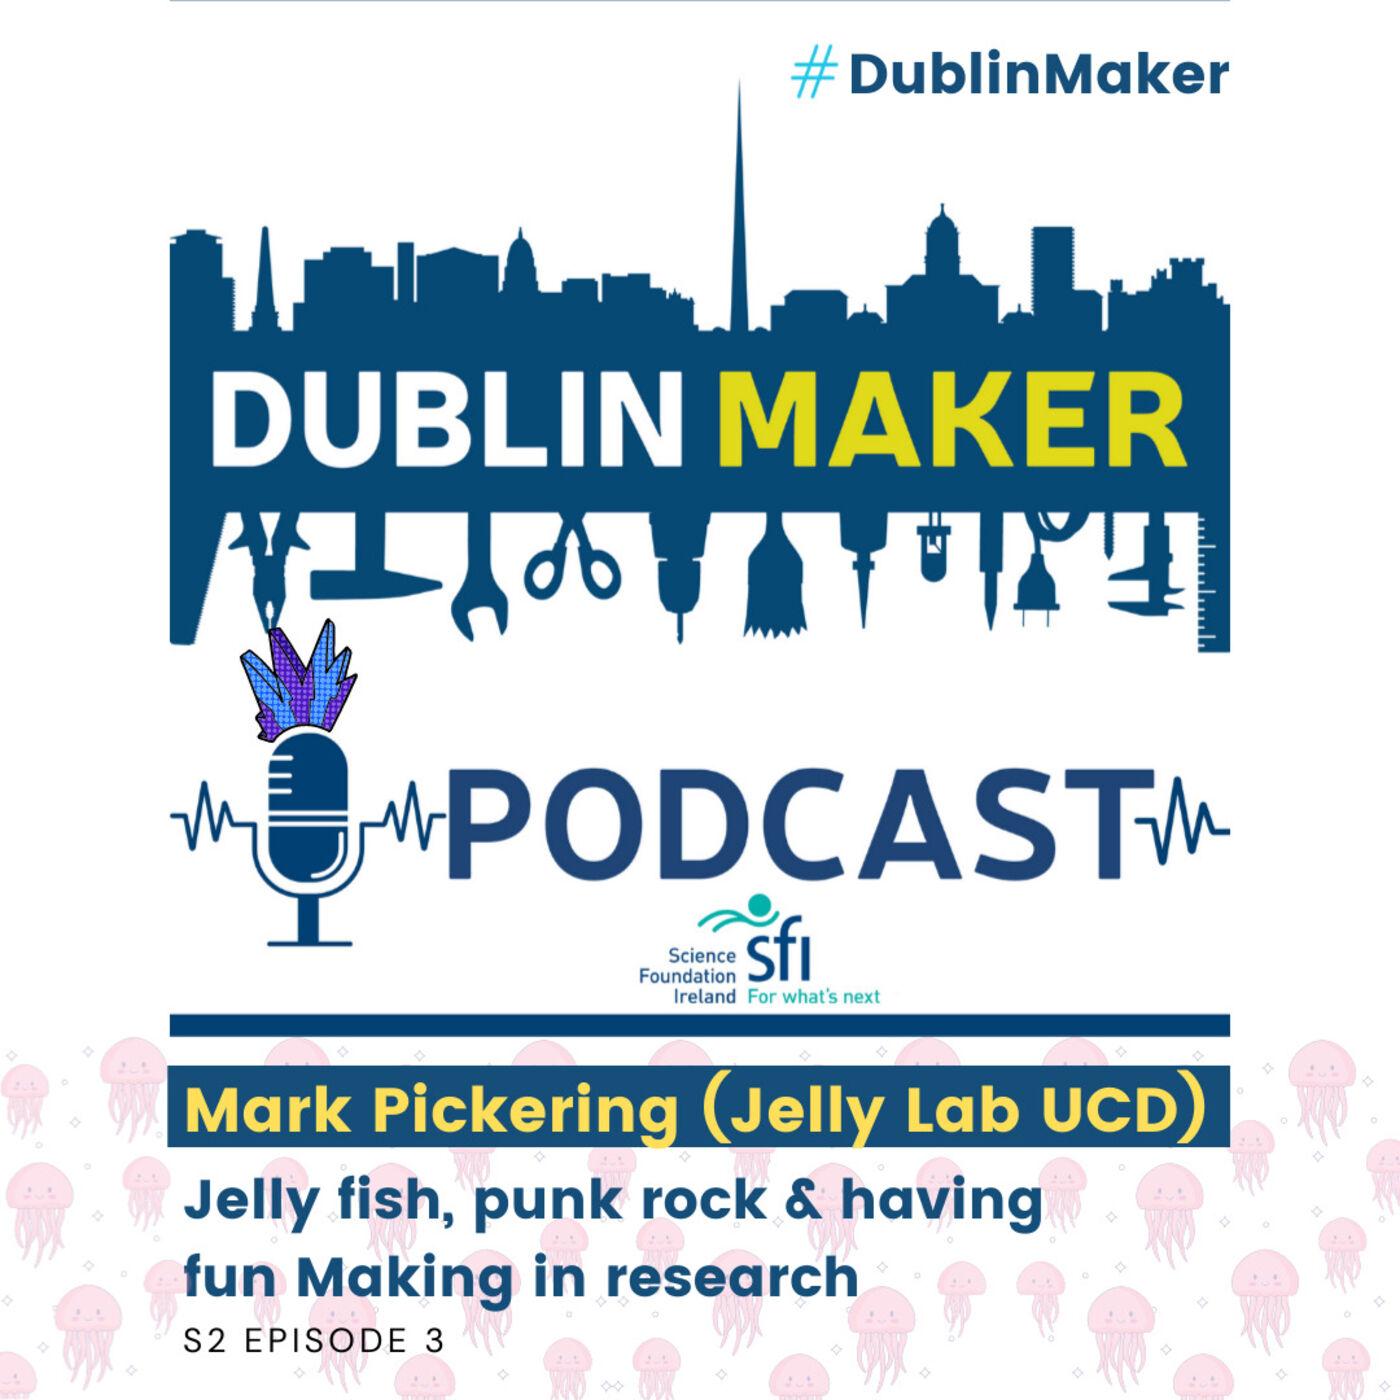 The Dublin Maker Podcast S2E3: Jellyfish, punk microscopy & Making with Mark Pickering (Jellylab UCD)